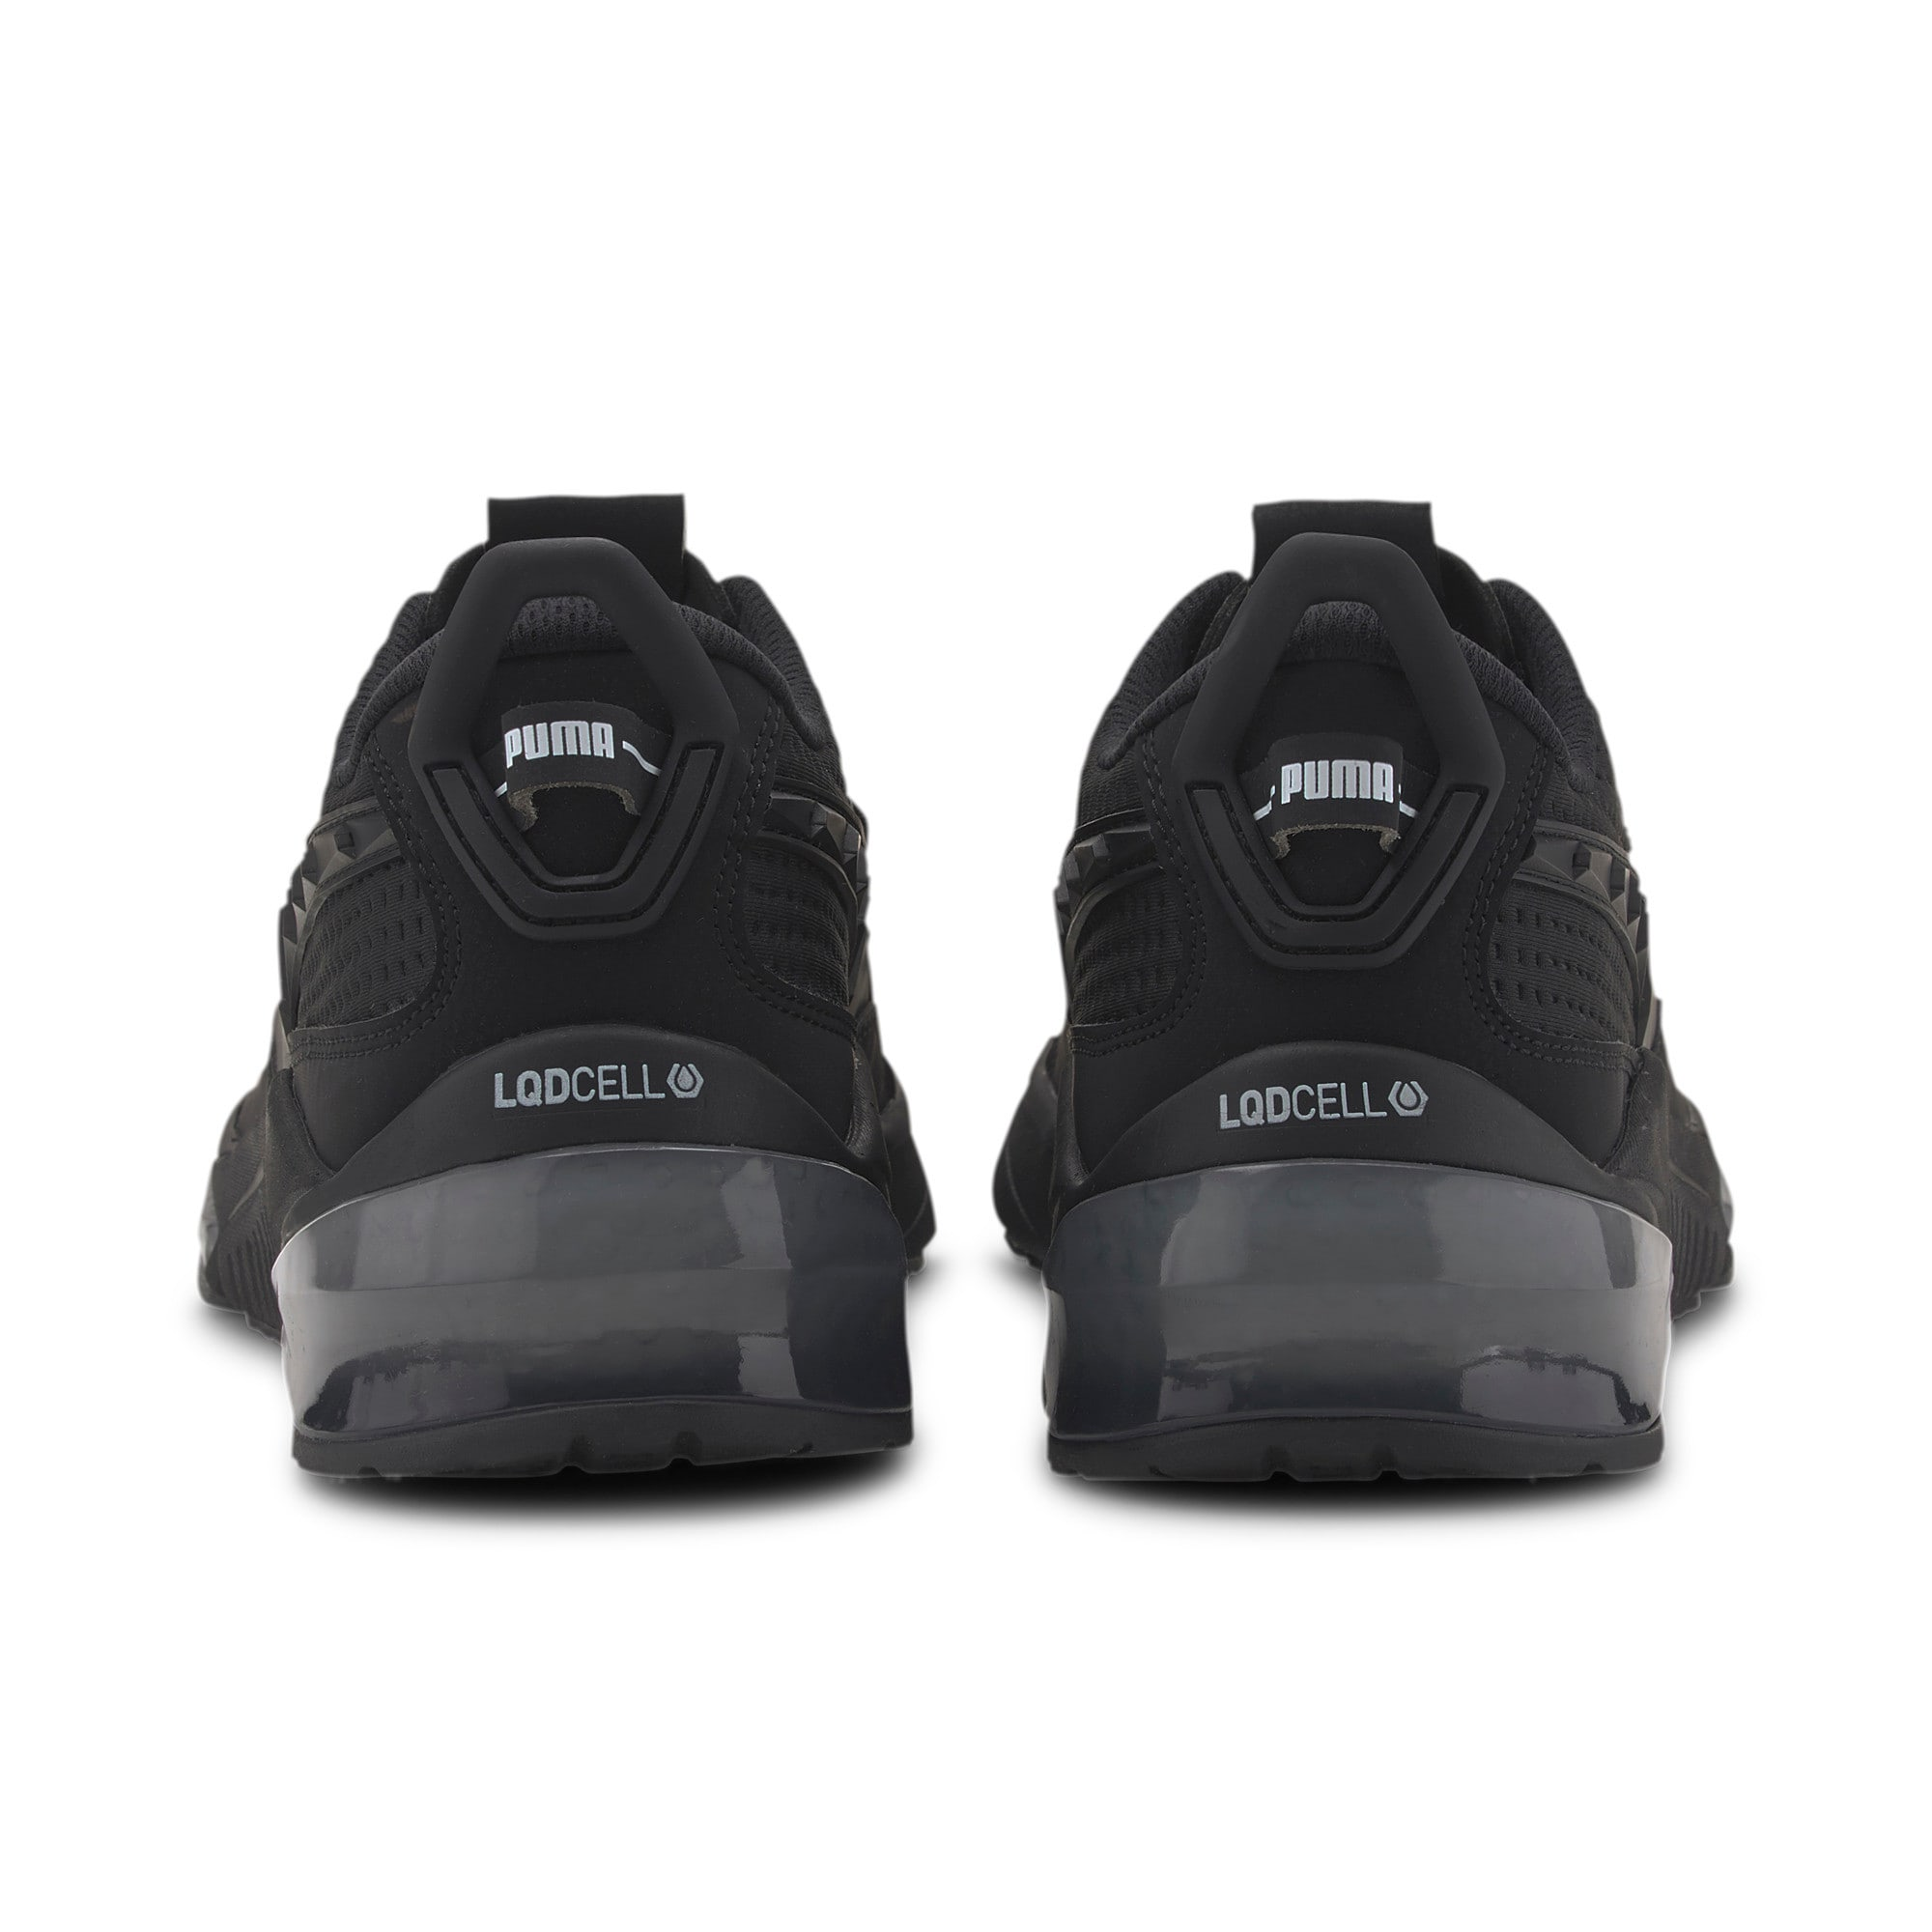 Thumbnail 4 of LQDCELL Optic Flight Suit Men's Training Shoes, Puma Black, medium